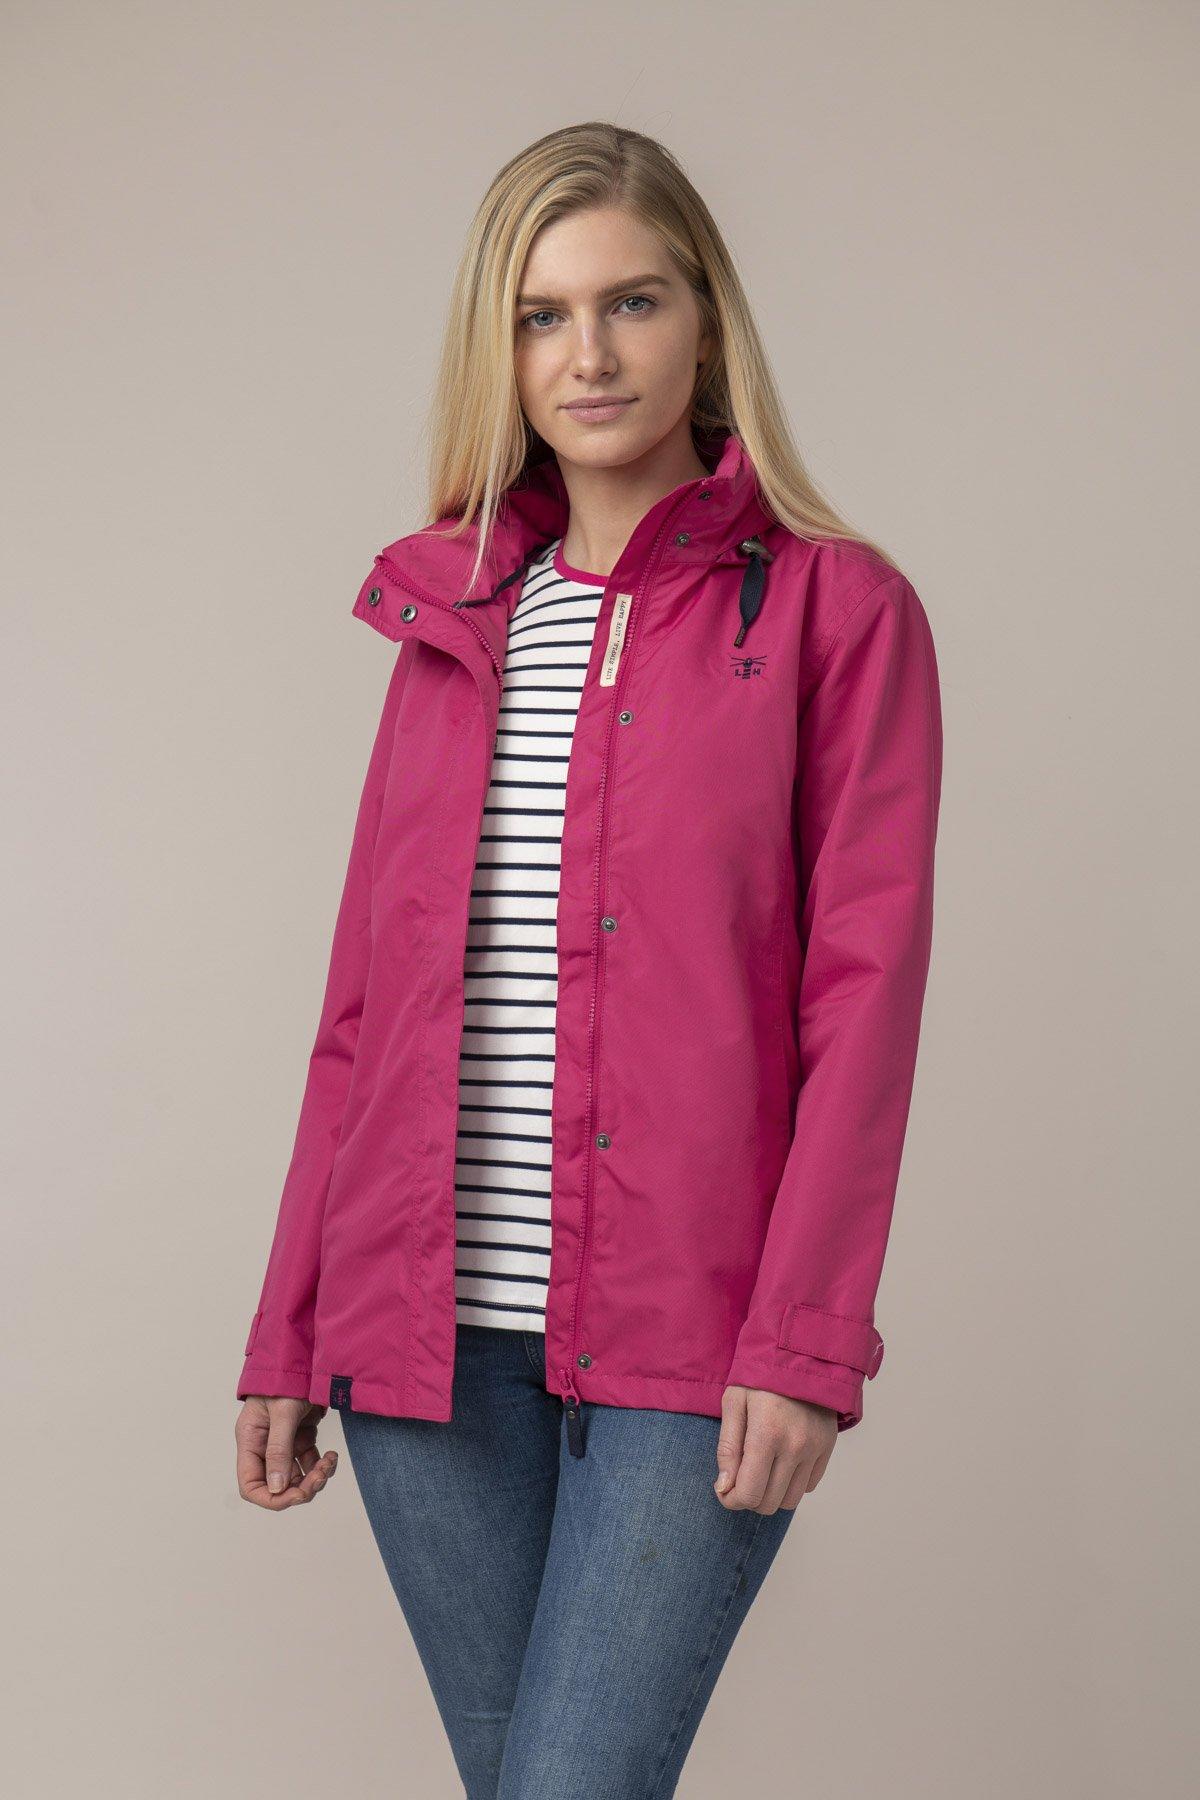 Lighthouse Beachcomber Jacket - Raspberry